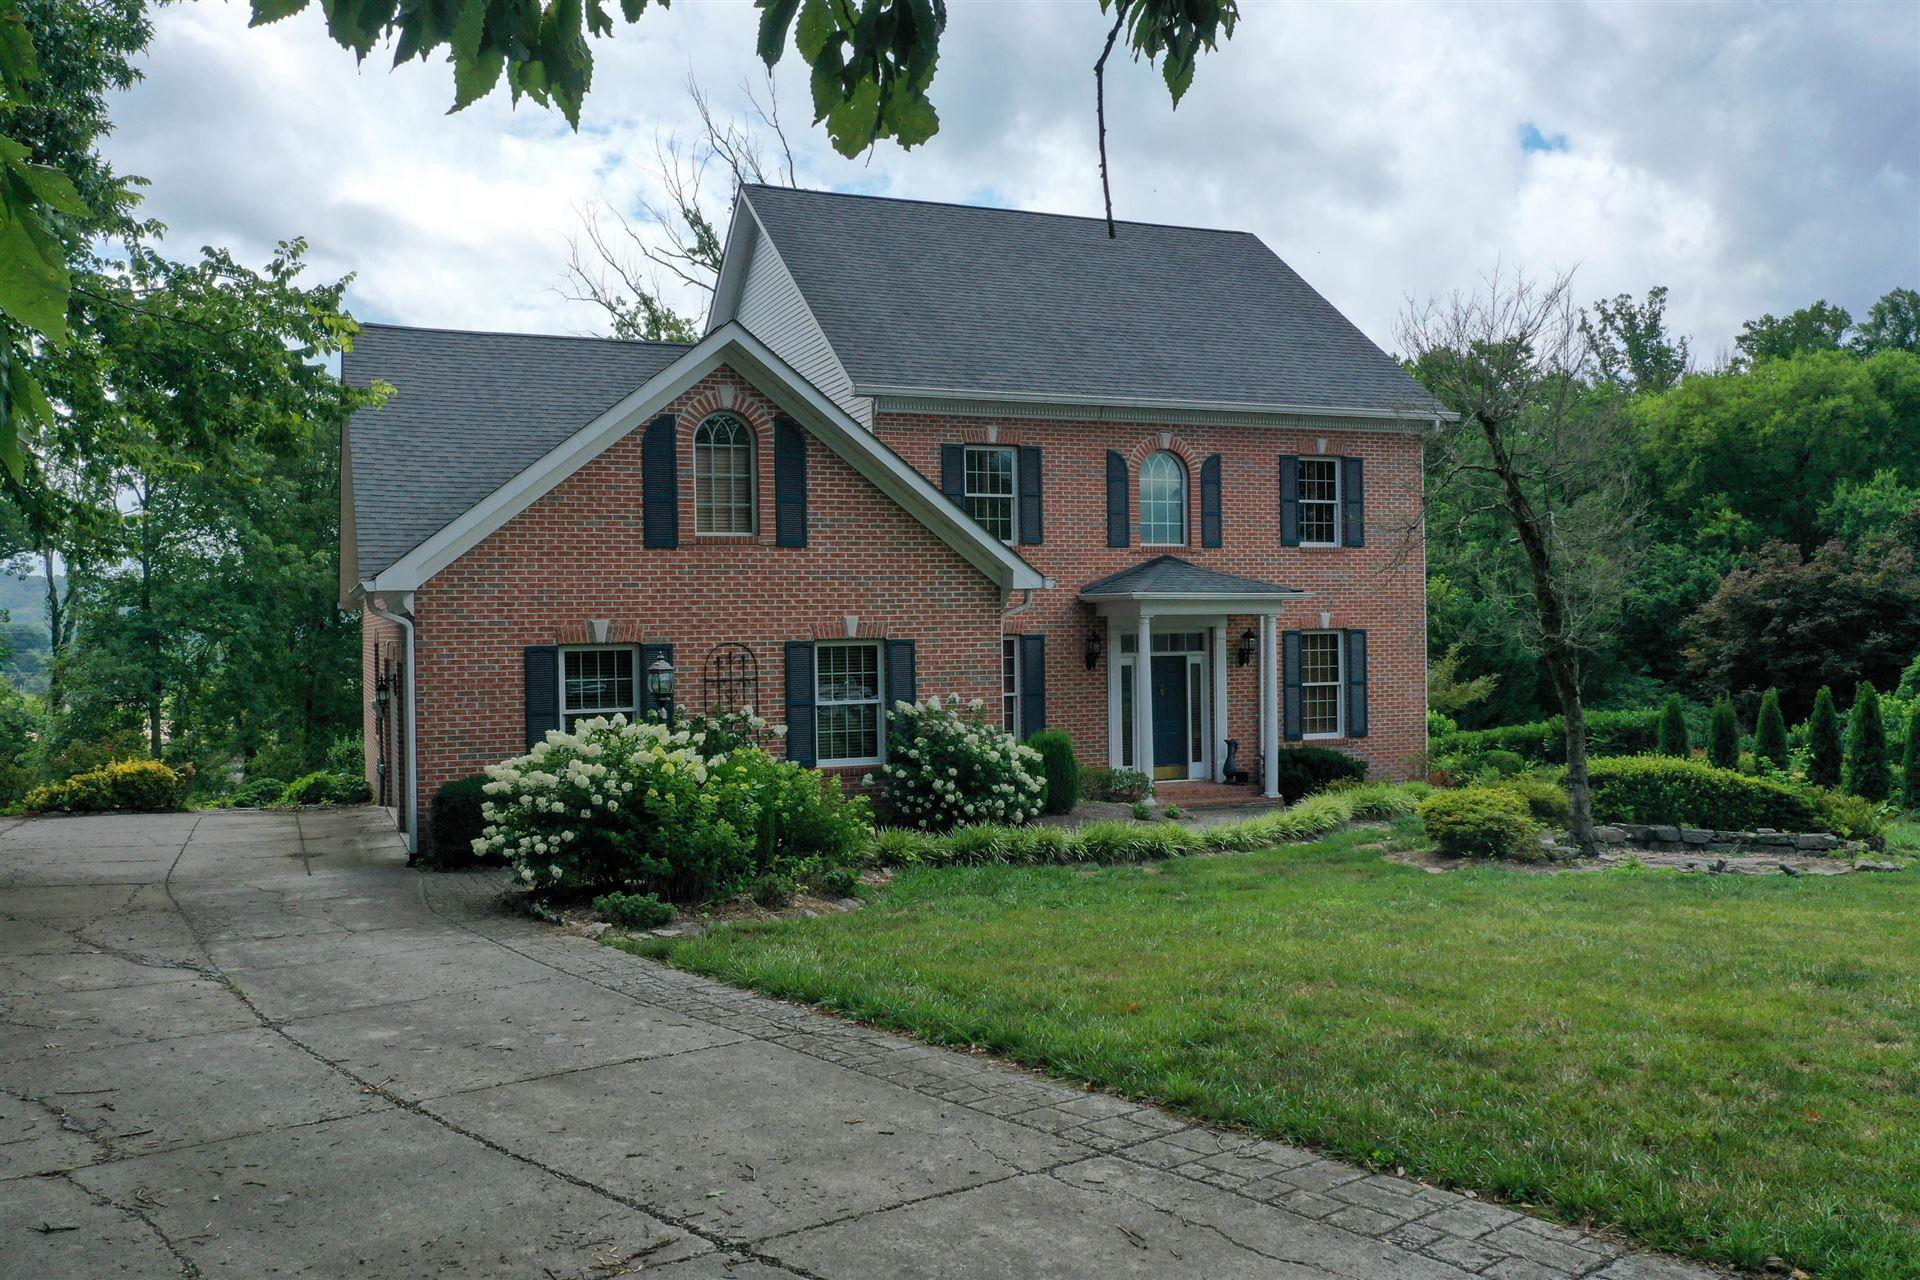 Photo of 320 Franklin Place, Clinton, TN 37716 (MLS # 1160590)